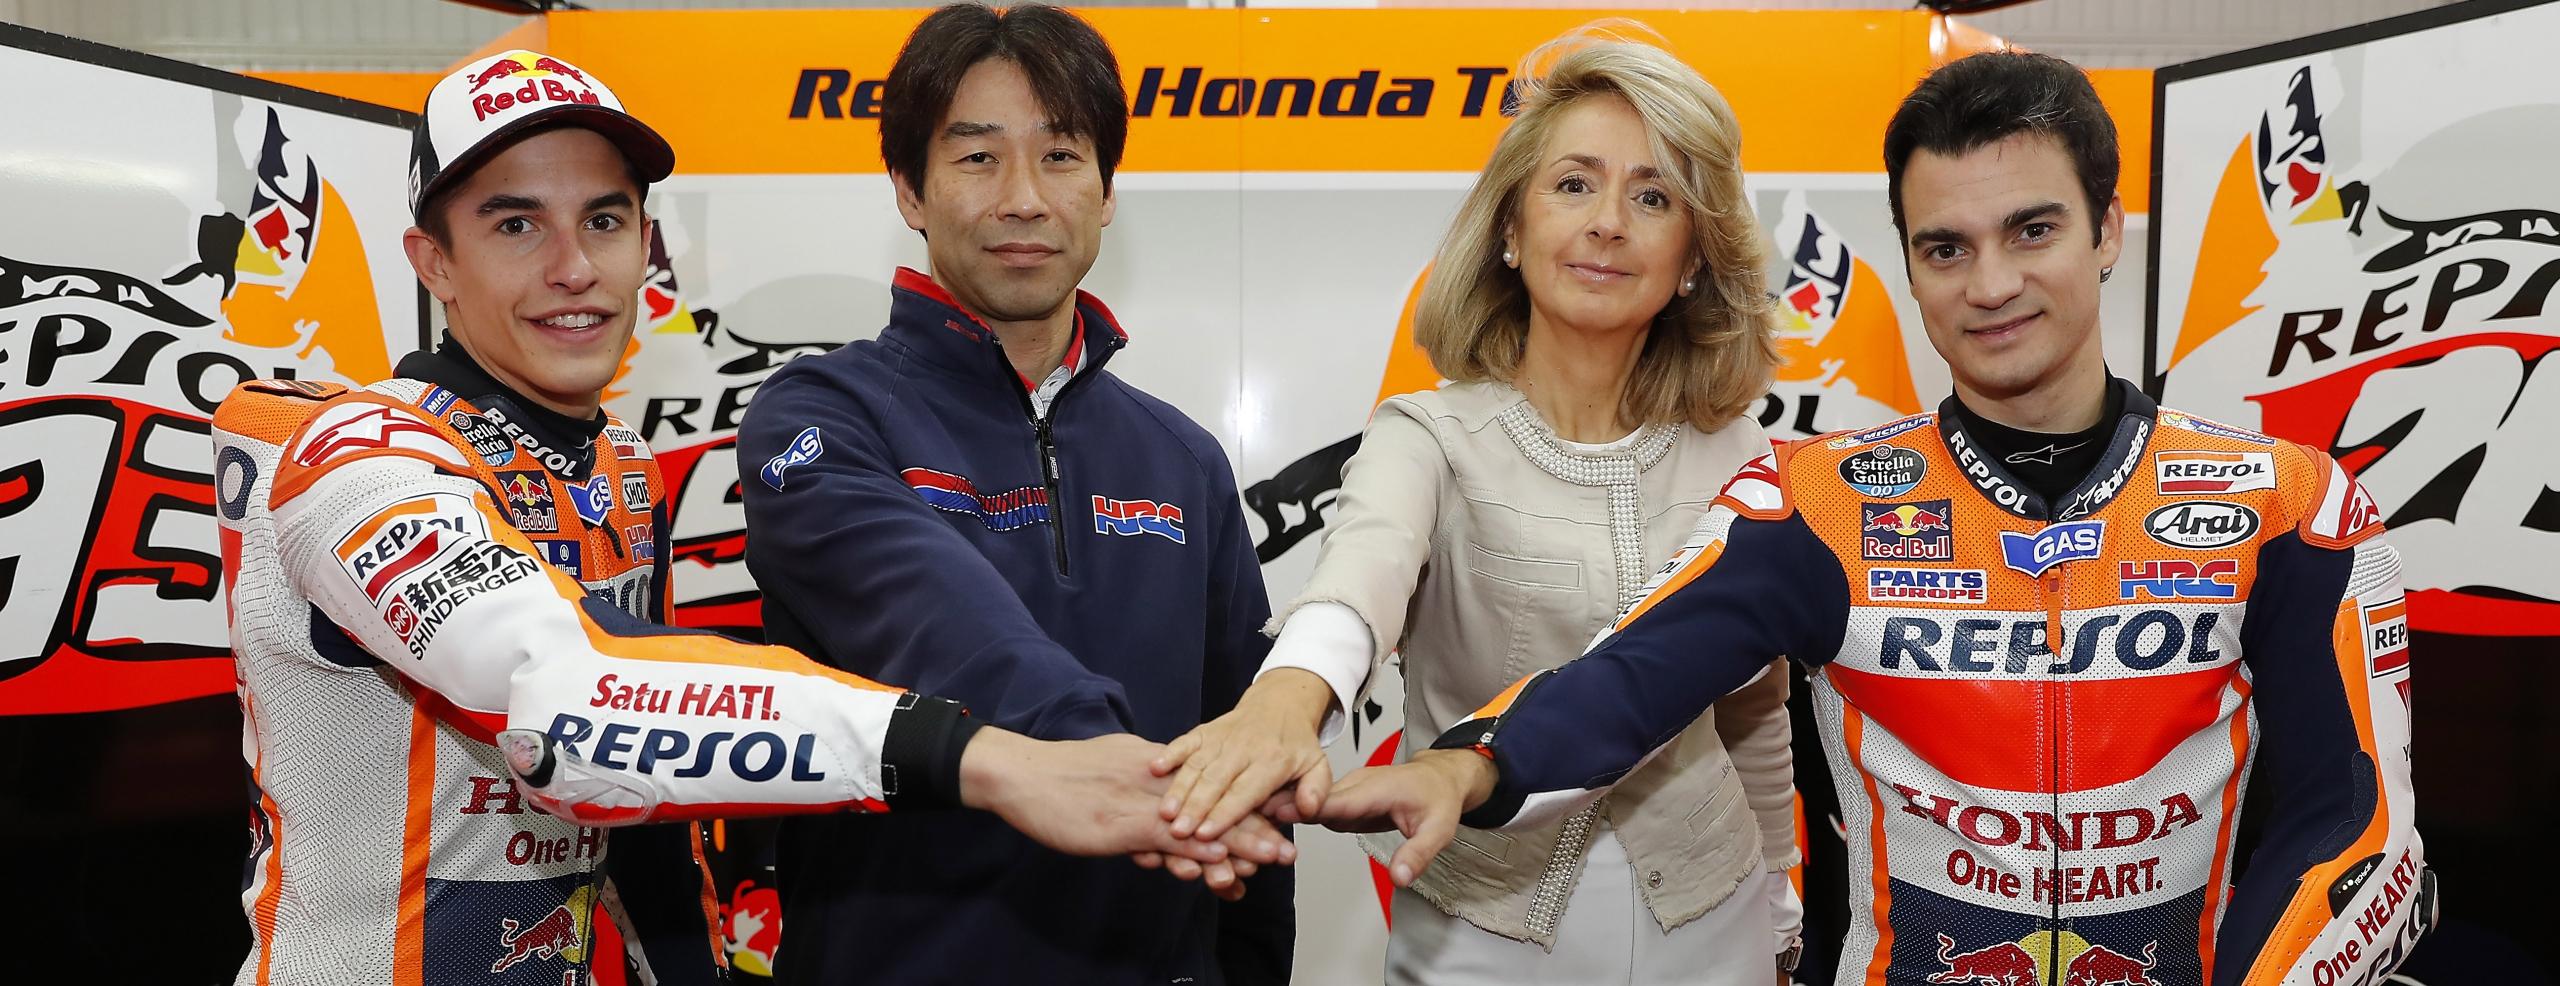 Repsol and Honda extend MotoGP contract until 2018